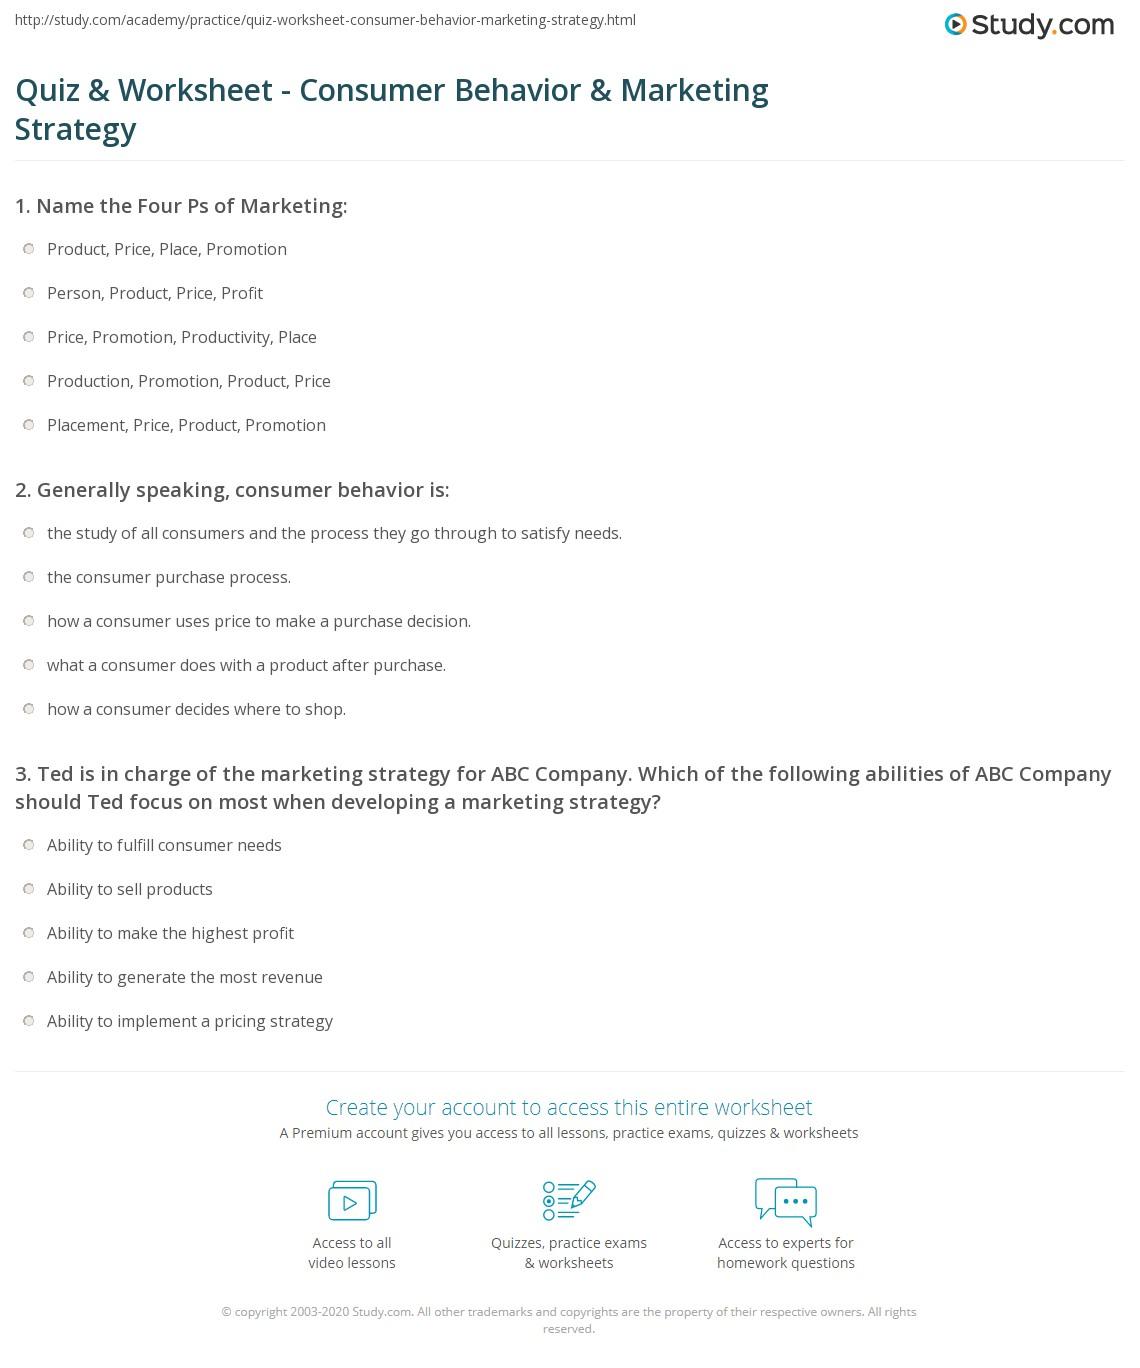 Quiz & Worksheet - Consumer Behavior & Marketing Strategy | Study.com